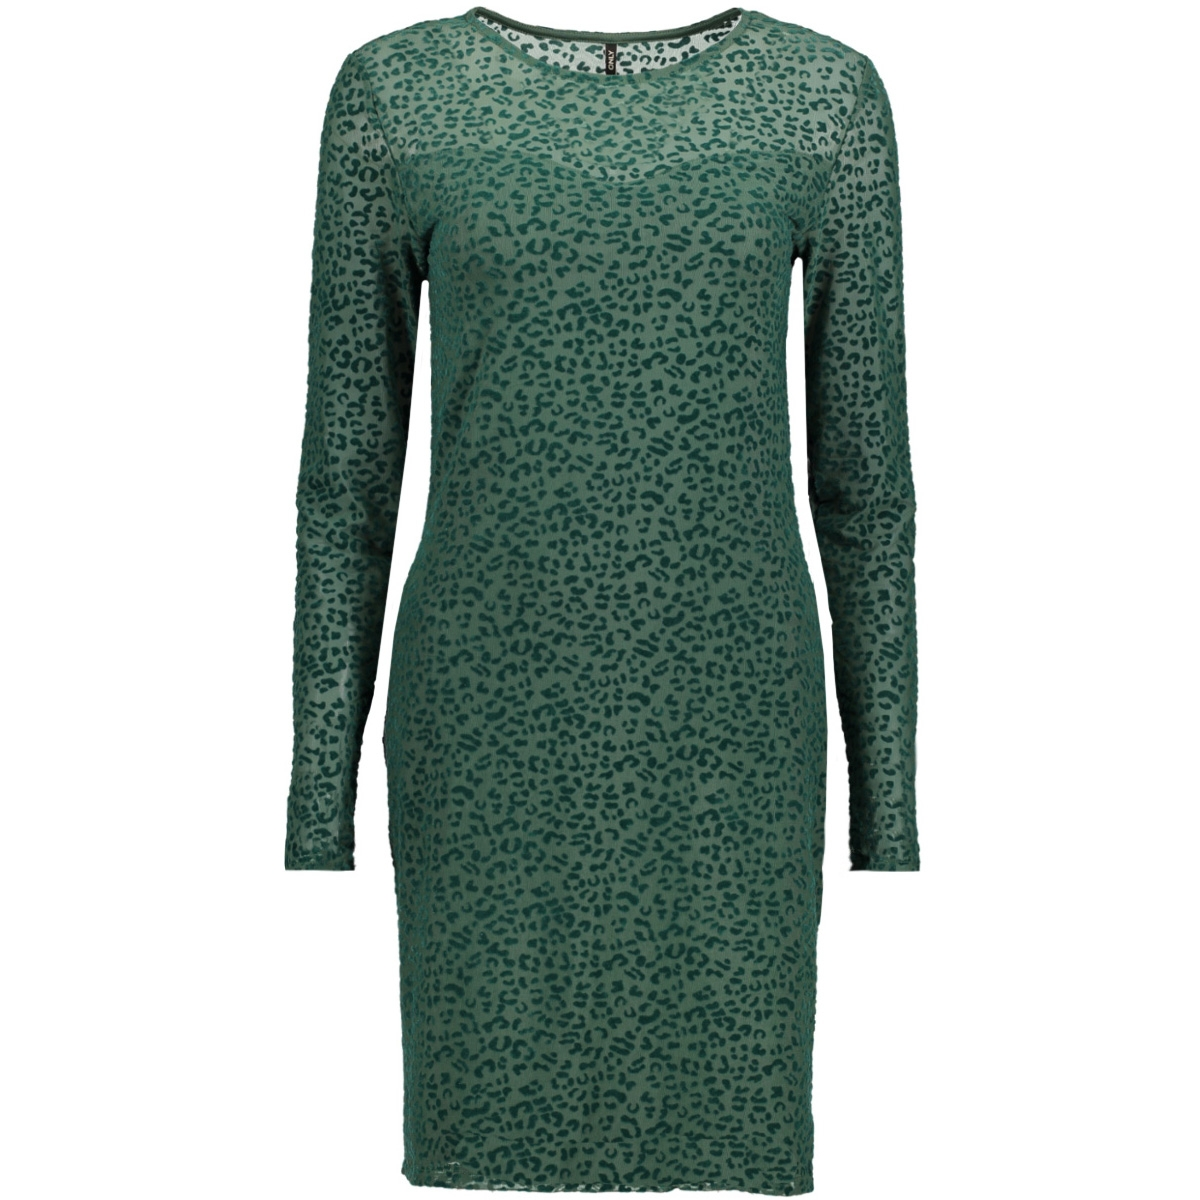 onlleo flock l/s dress ess 15143378 only jurk dark green/leo